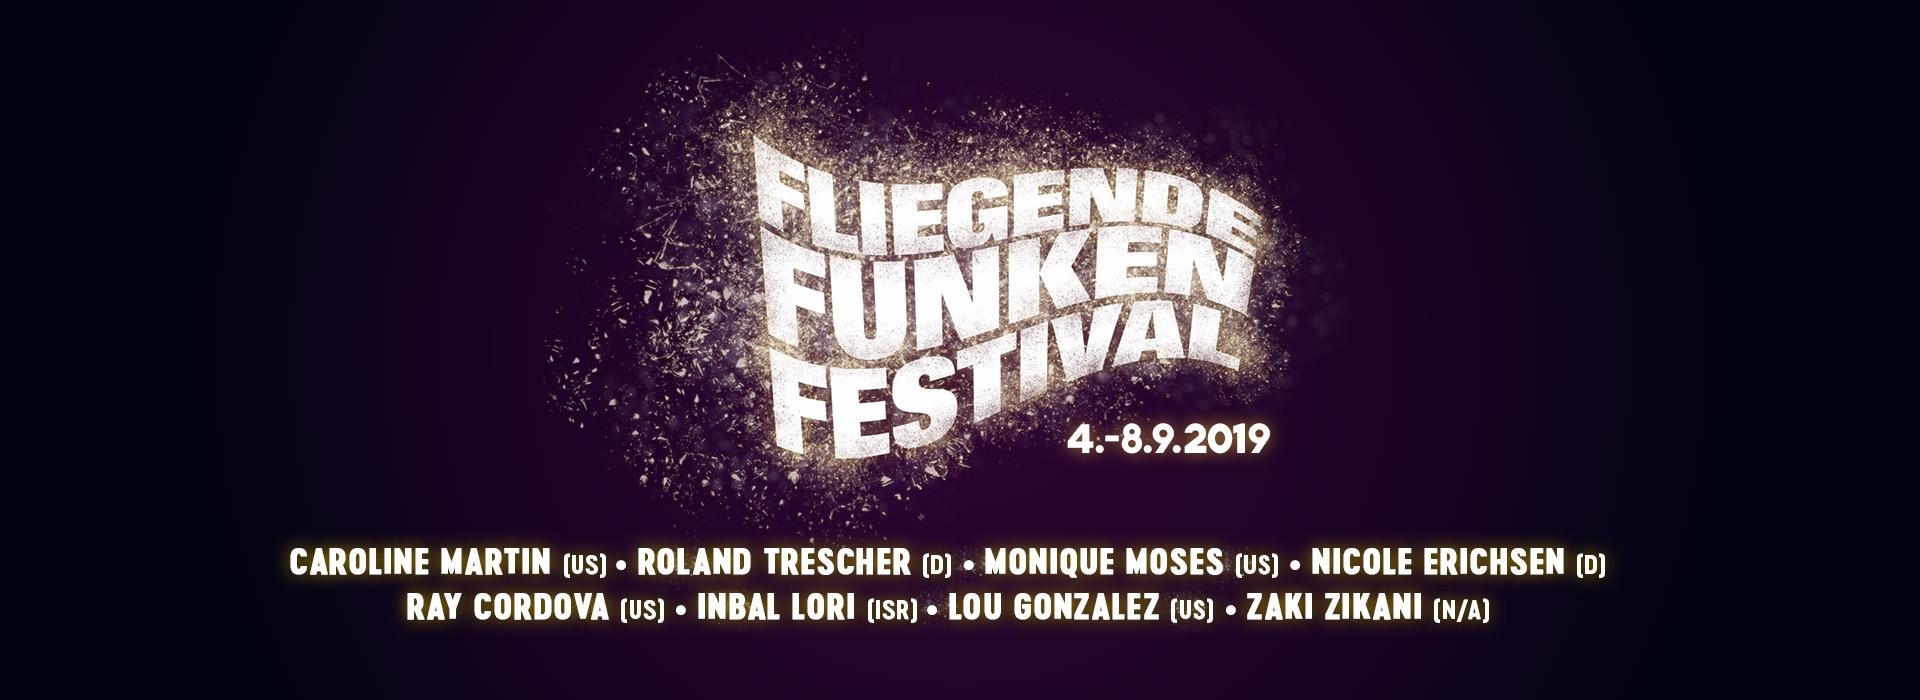 Fliegende Funken Festival Improtheater Festival In Bremen